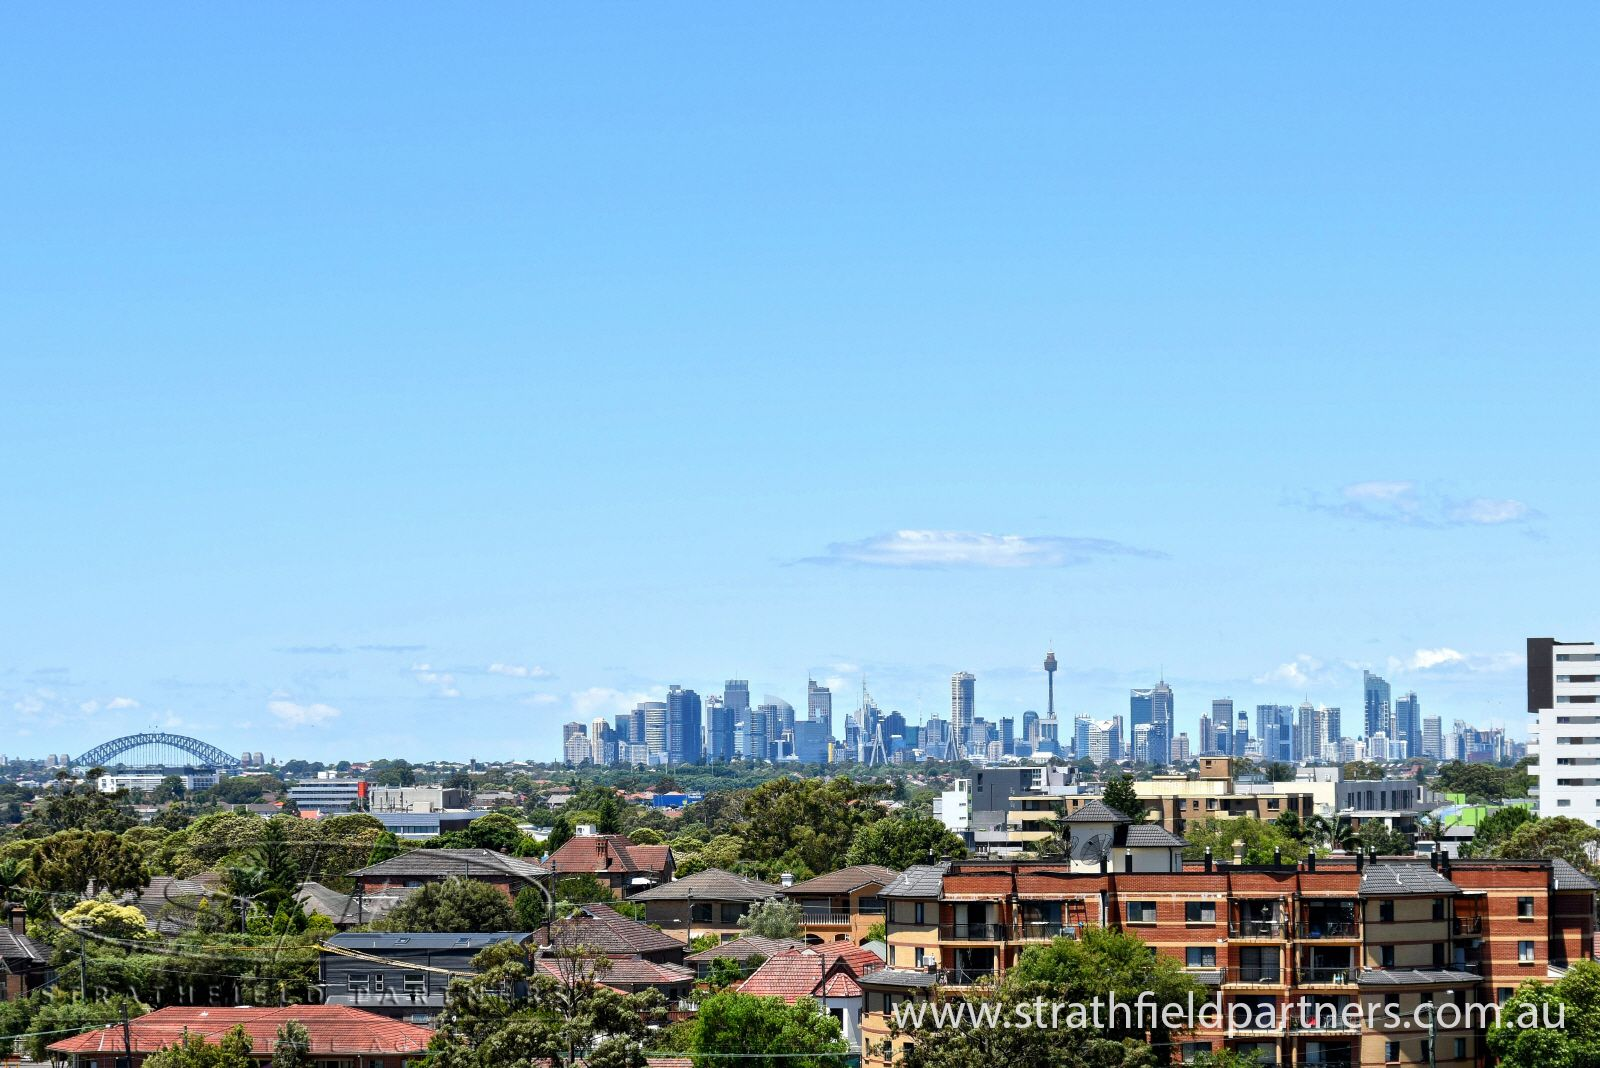 503/29 Morwick Street, Strathfield NSW 2135, Image 0